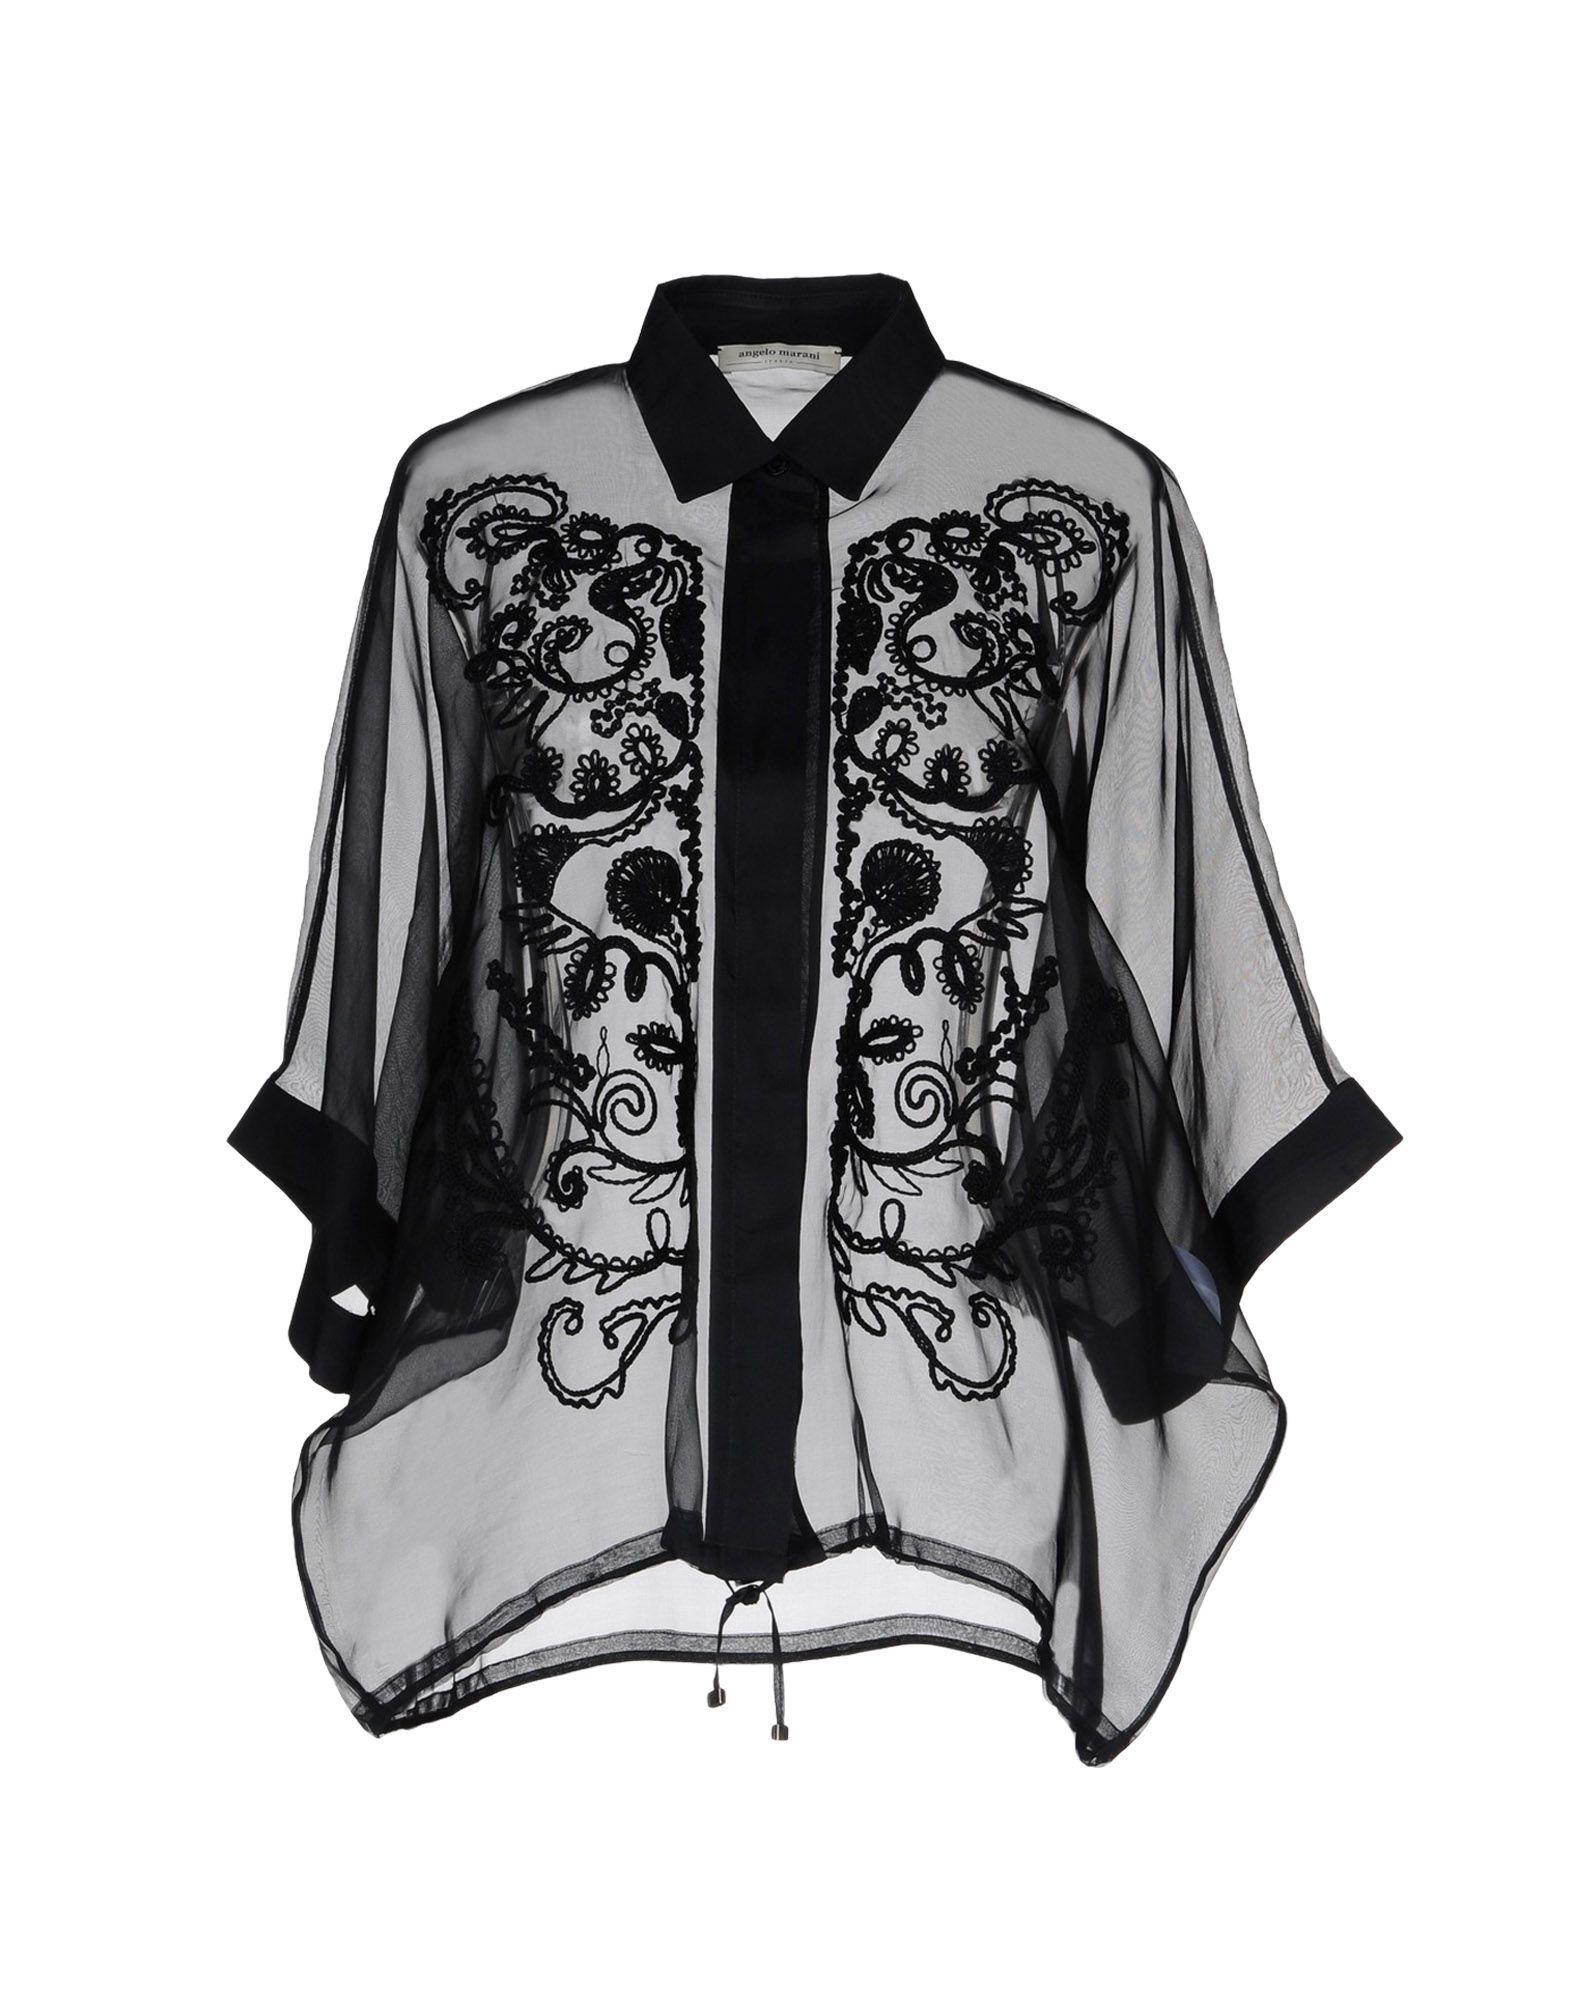 ANGELO MARANI レディース シャツ ブラック 40 ポリエステル 100%